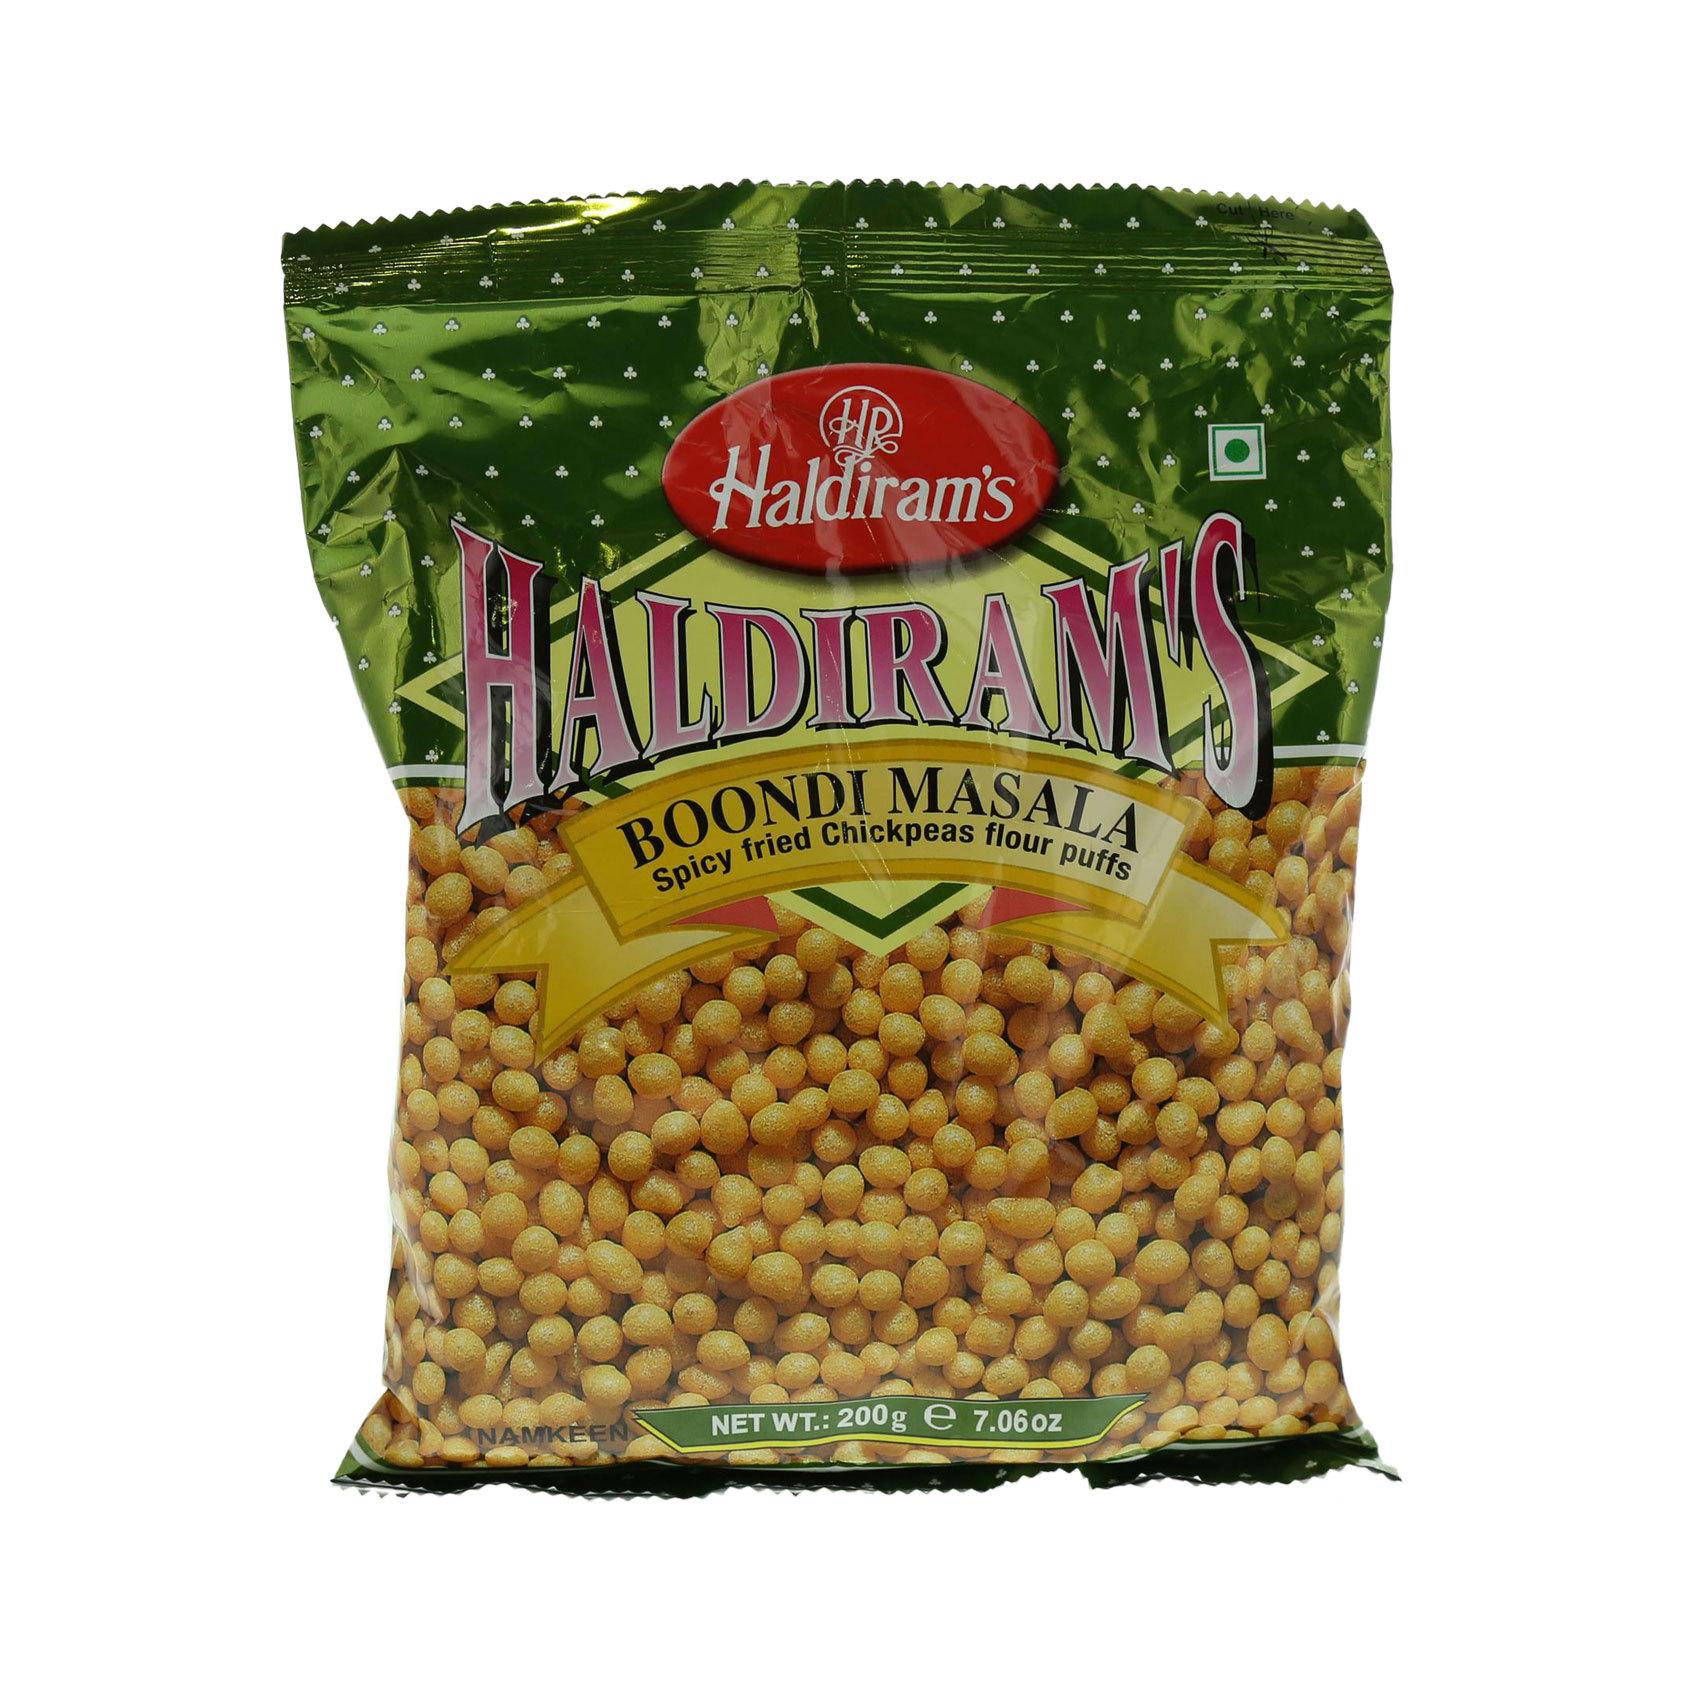 HALDIRAM'S MASALA BOONDI N 200G